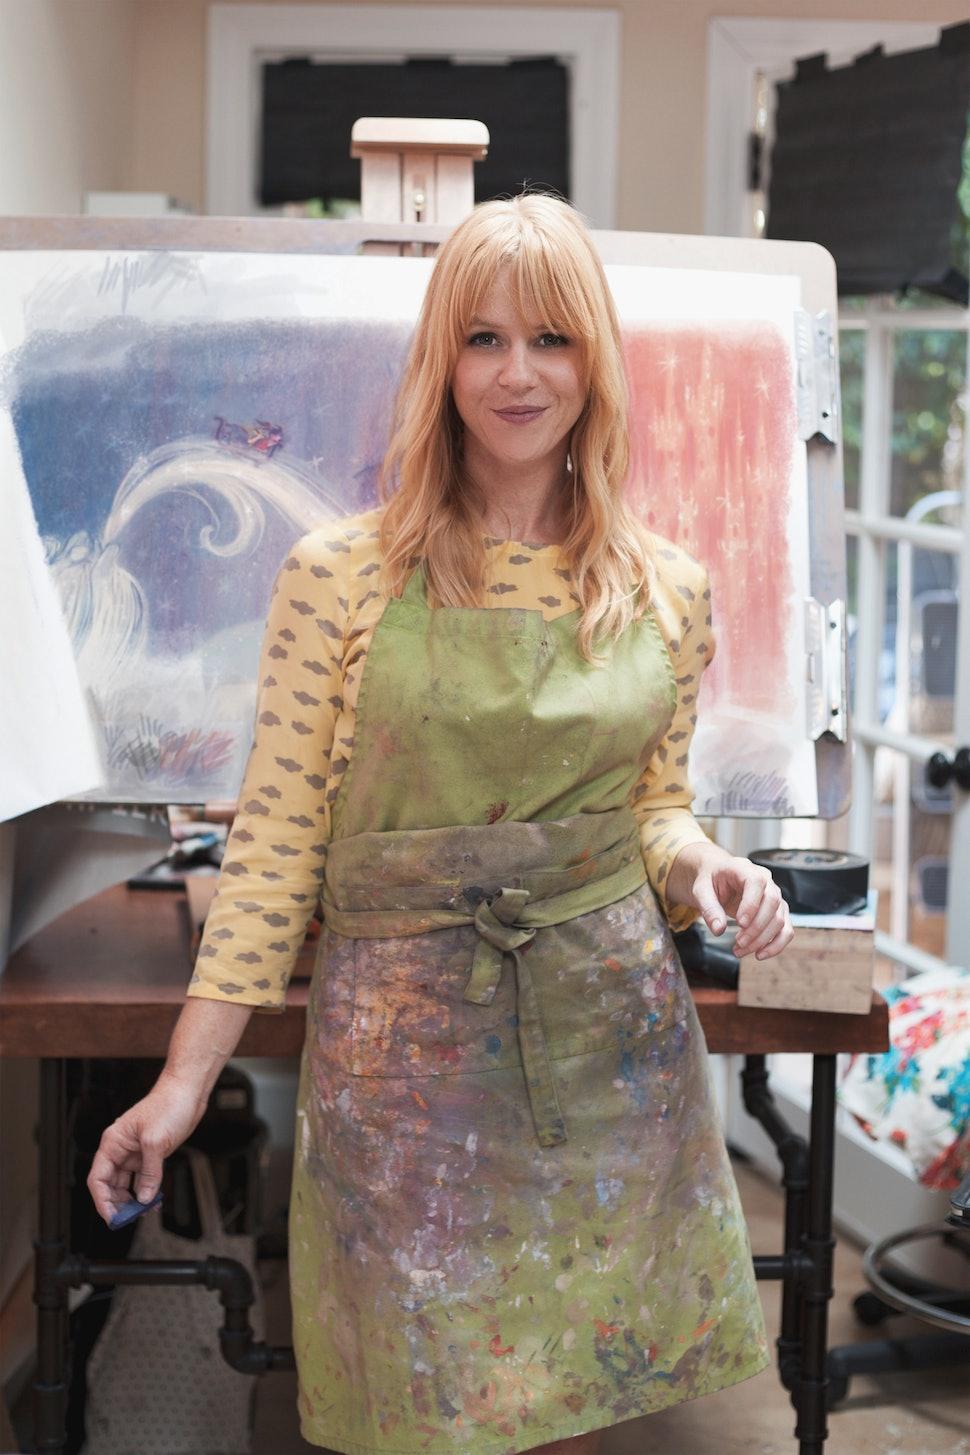 disneys frozen artist claire keane debuts childrens